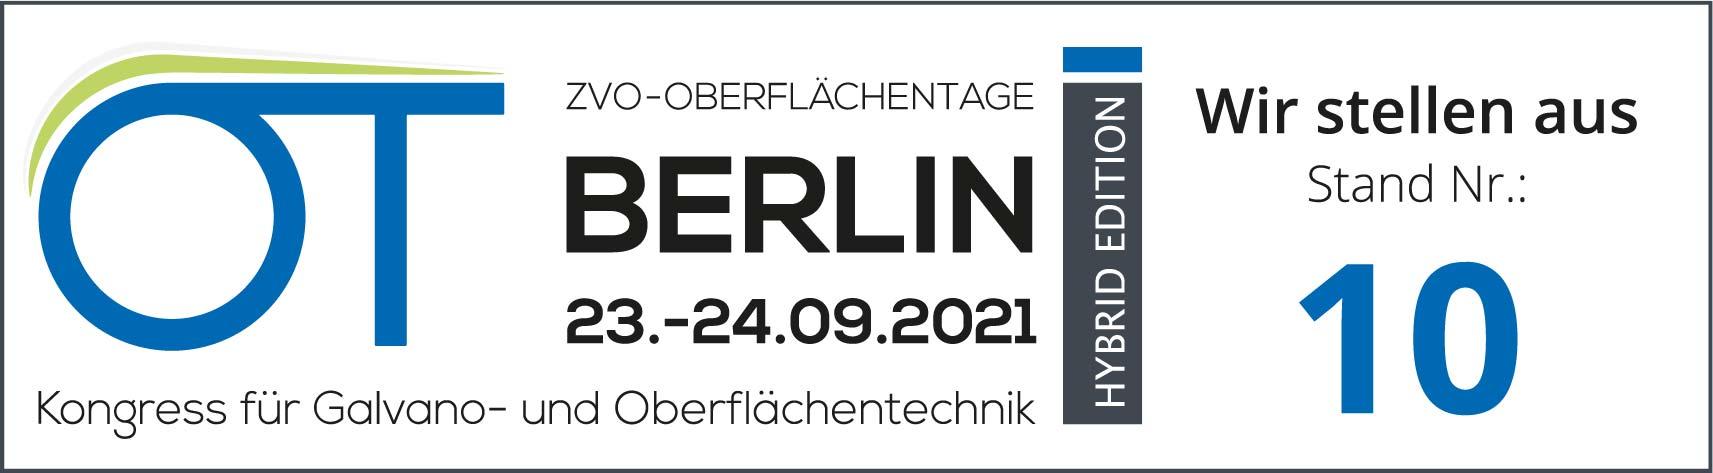 ZVO Berlin 2021 Reinhardt